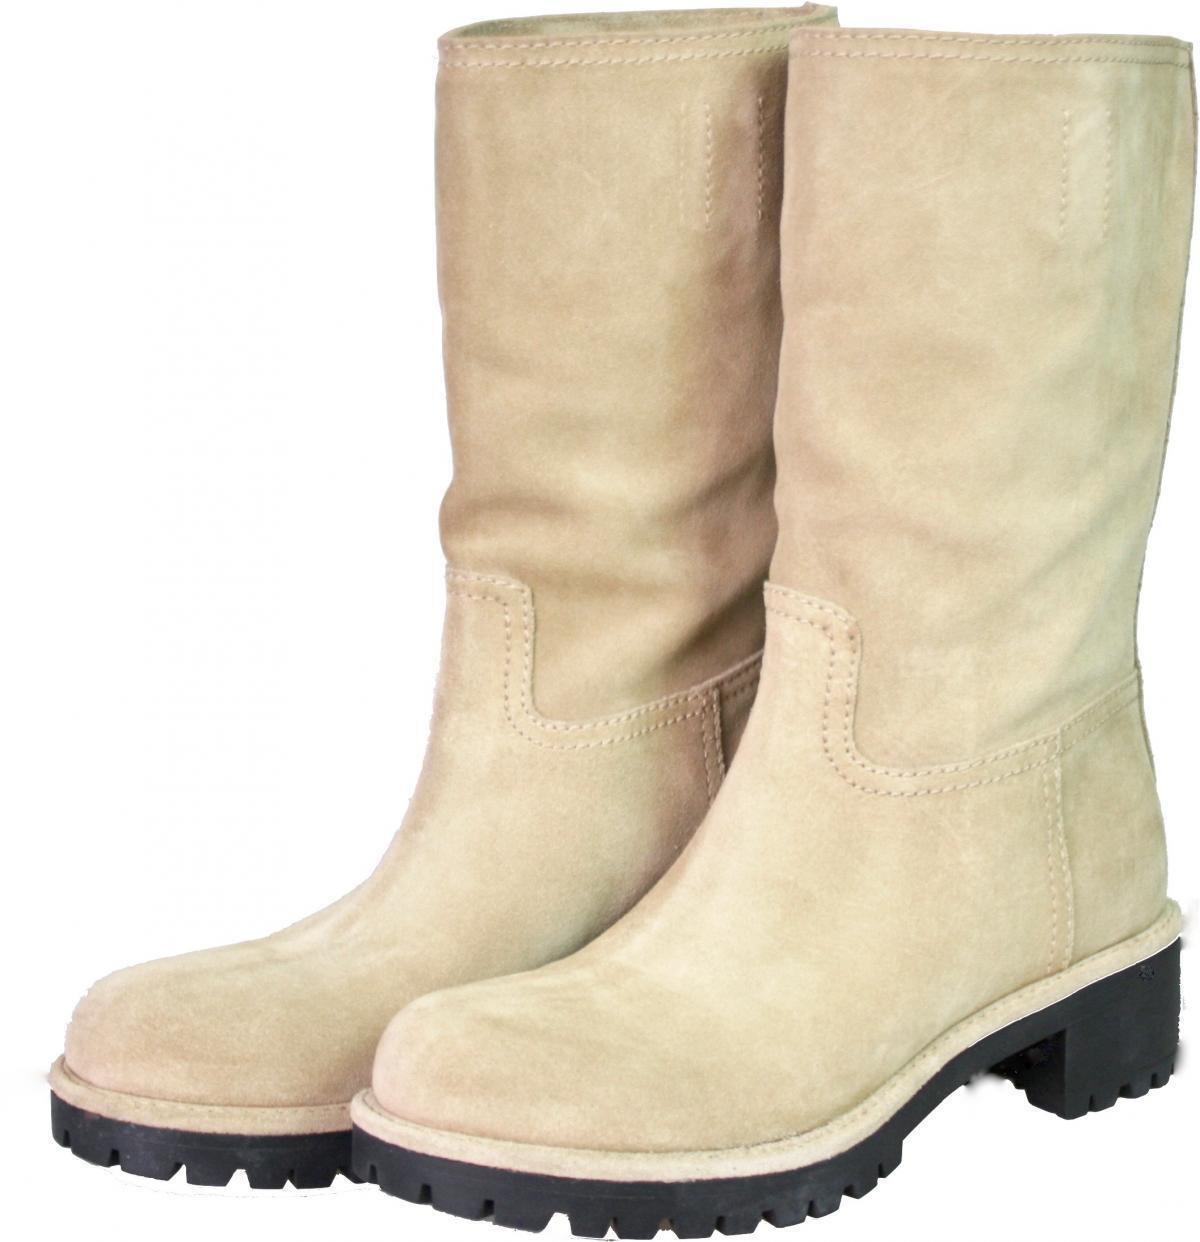 AUTHENTIC LUXURY PRADA BOOTS 3U5901 BEIGE SUEDE NEW US 9 EU 39 39,5 UK 6